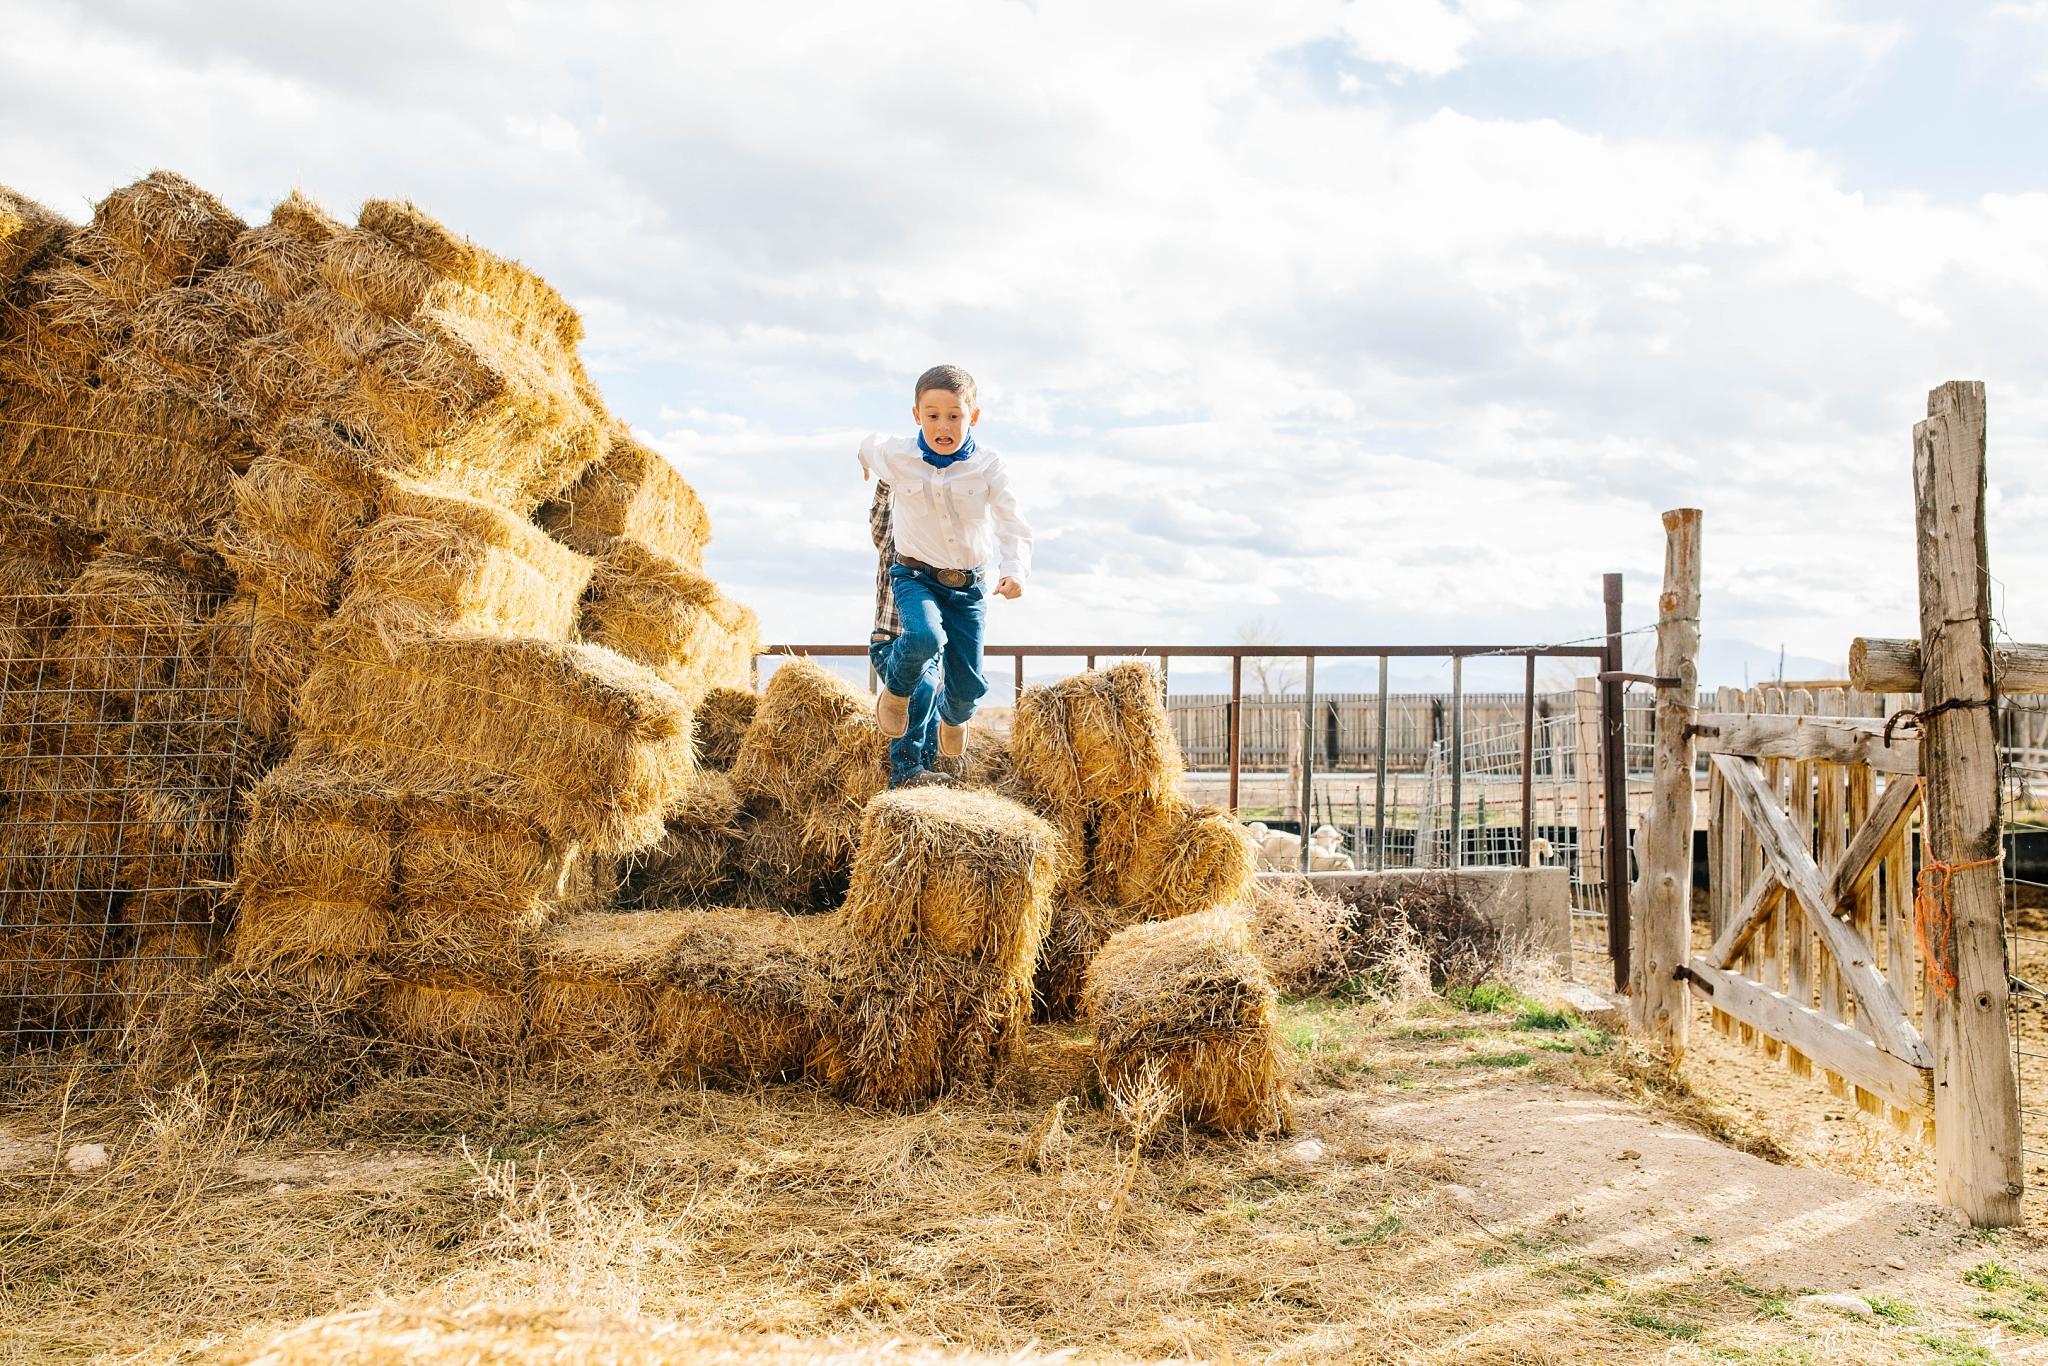 Lister-26_Lizzie-B-Imagery-Utah-Family-Photographer-Lifestyle-Photography-Salt-Lake-City-Park-City-Utah-County-Farm-Family-Session.jpg